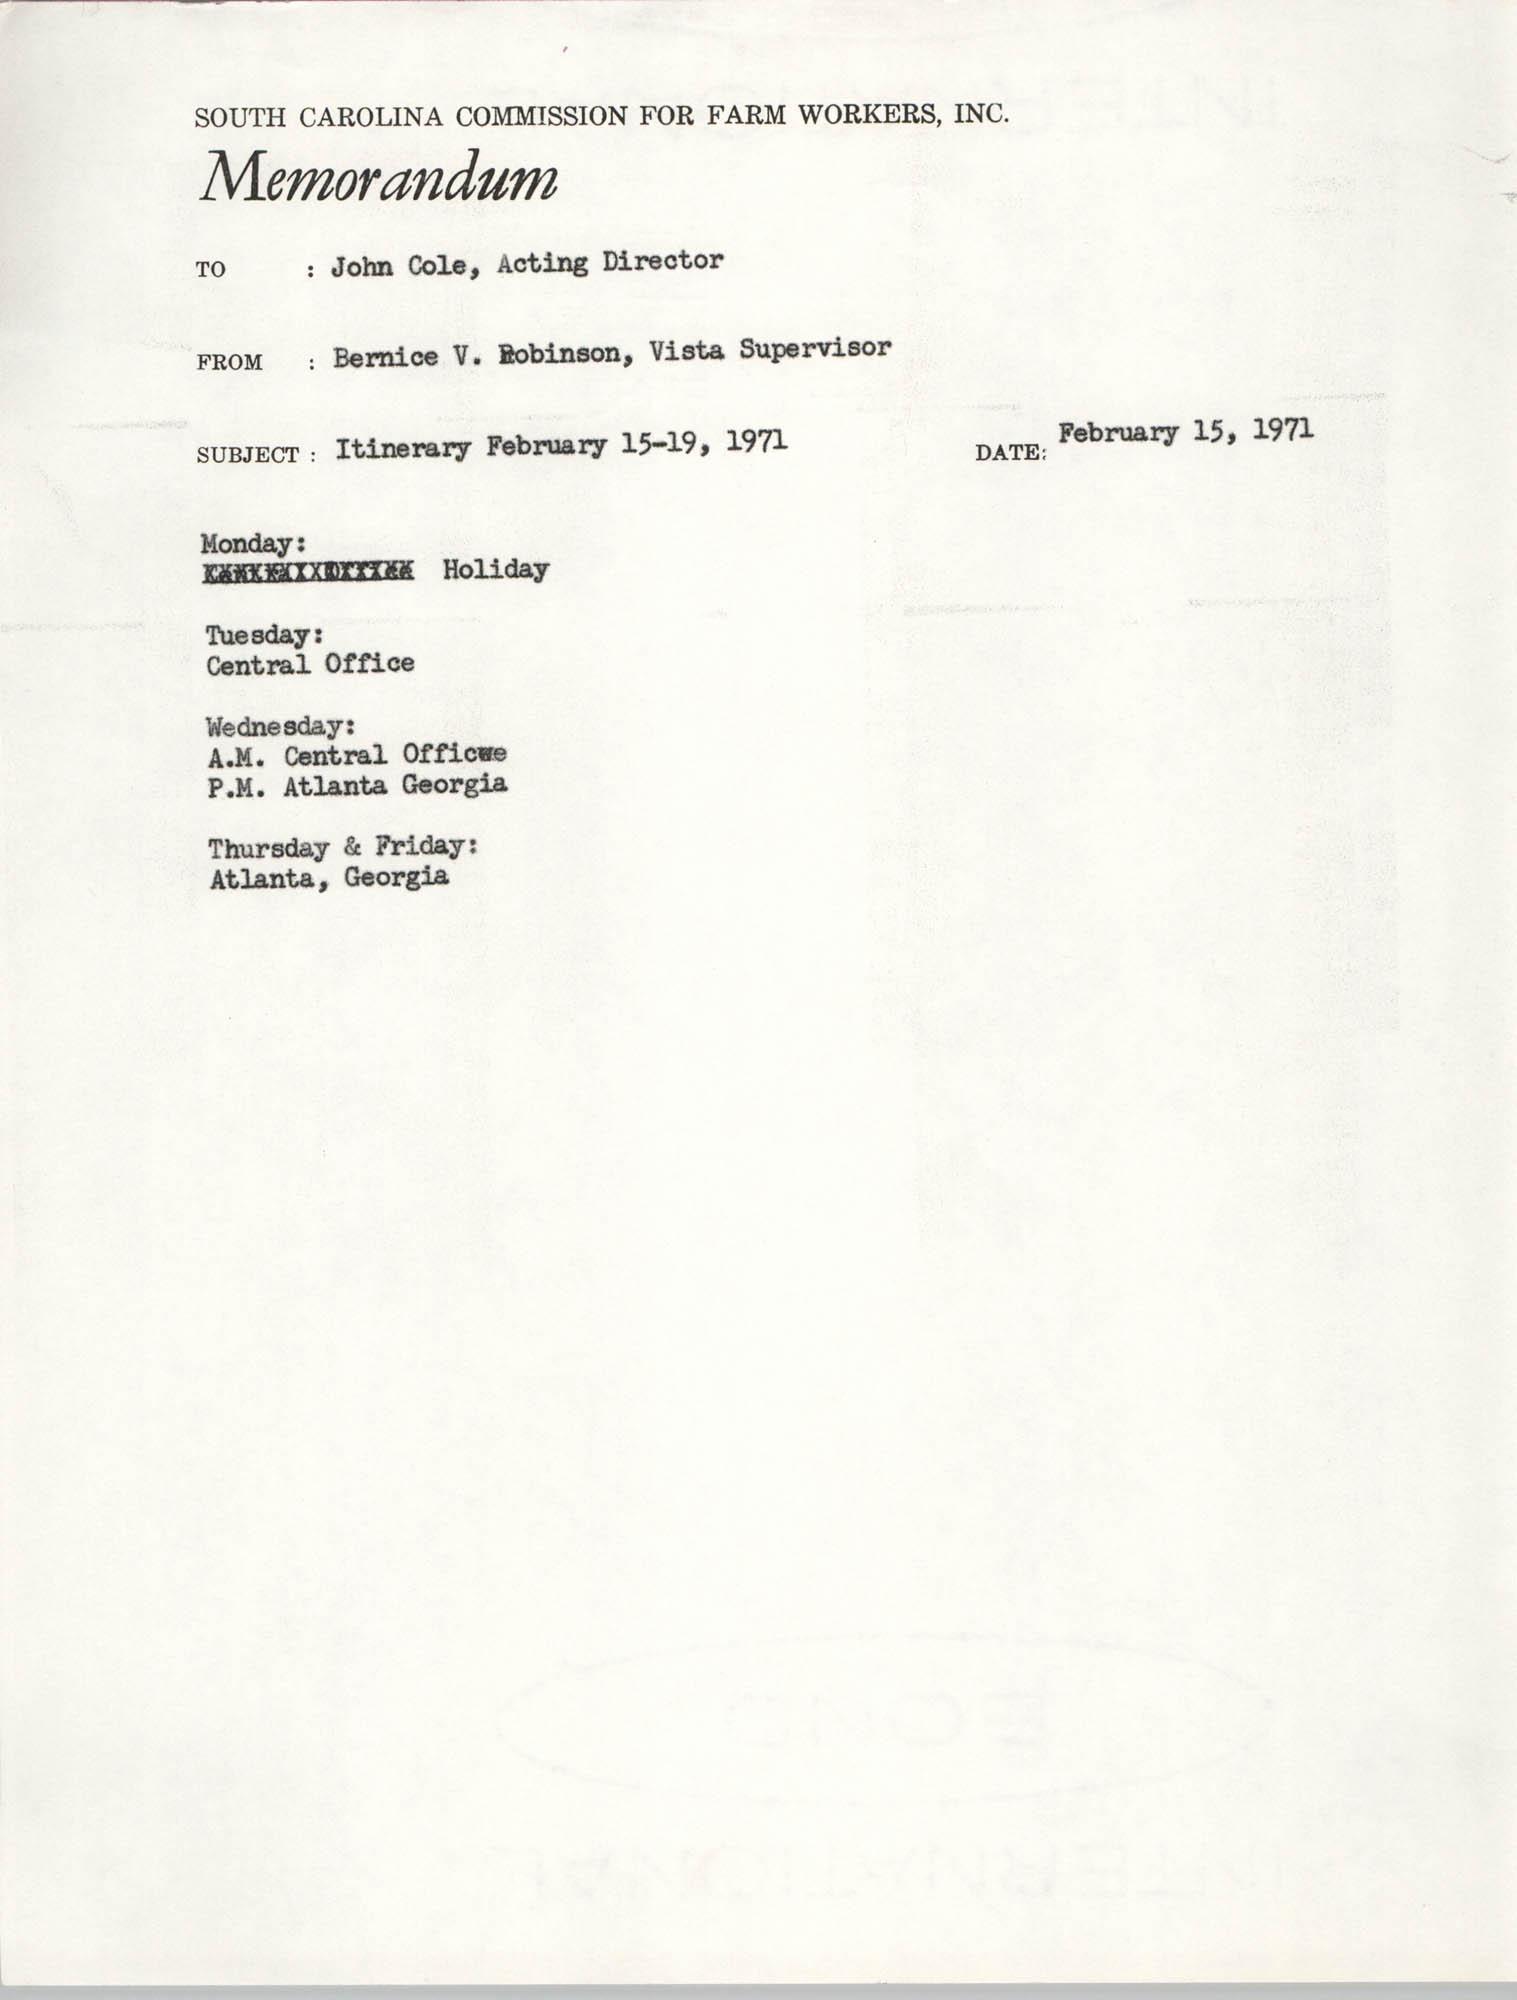 Memorandum from Bernice V. Robinson to John Cole, February 15, 1971